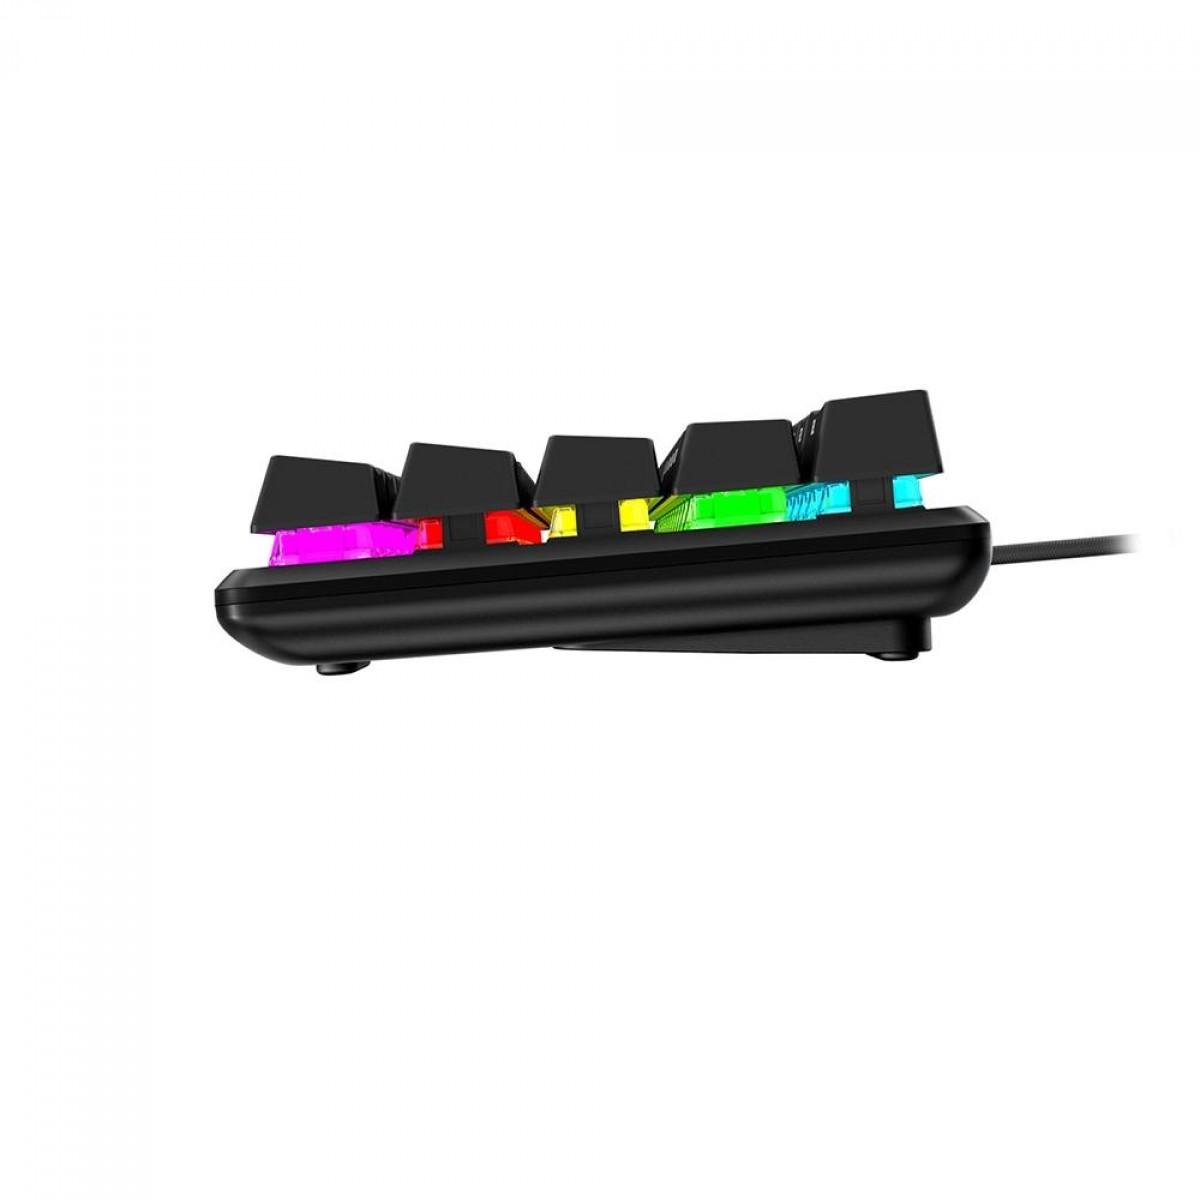 Teclado Mecânico Gamer HyperX Alloy Origins 60%, RGB, Switch HyperX Red, US, HKBO1S-RB-US/G